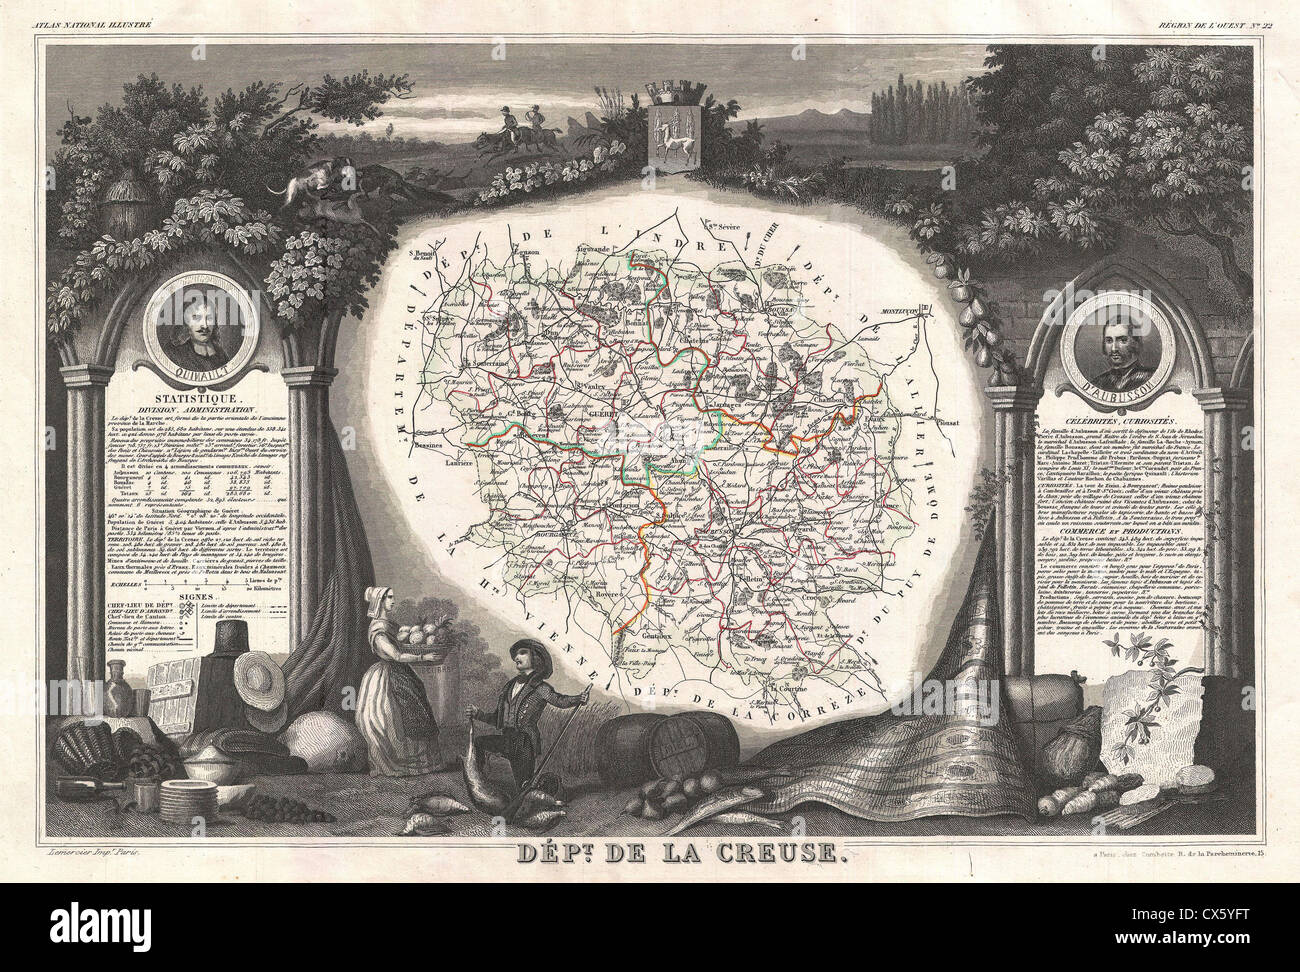 1852 Levasseur Map of the Department La Creuse, France - Stock Image